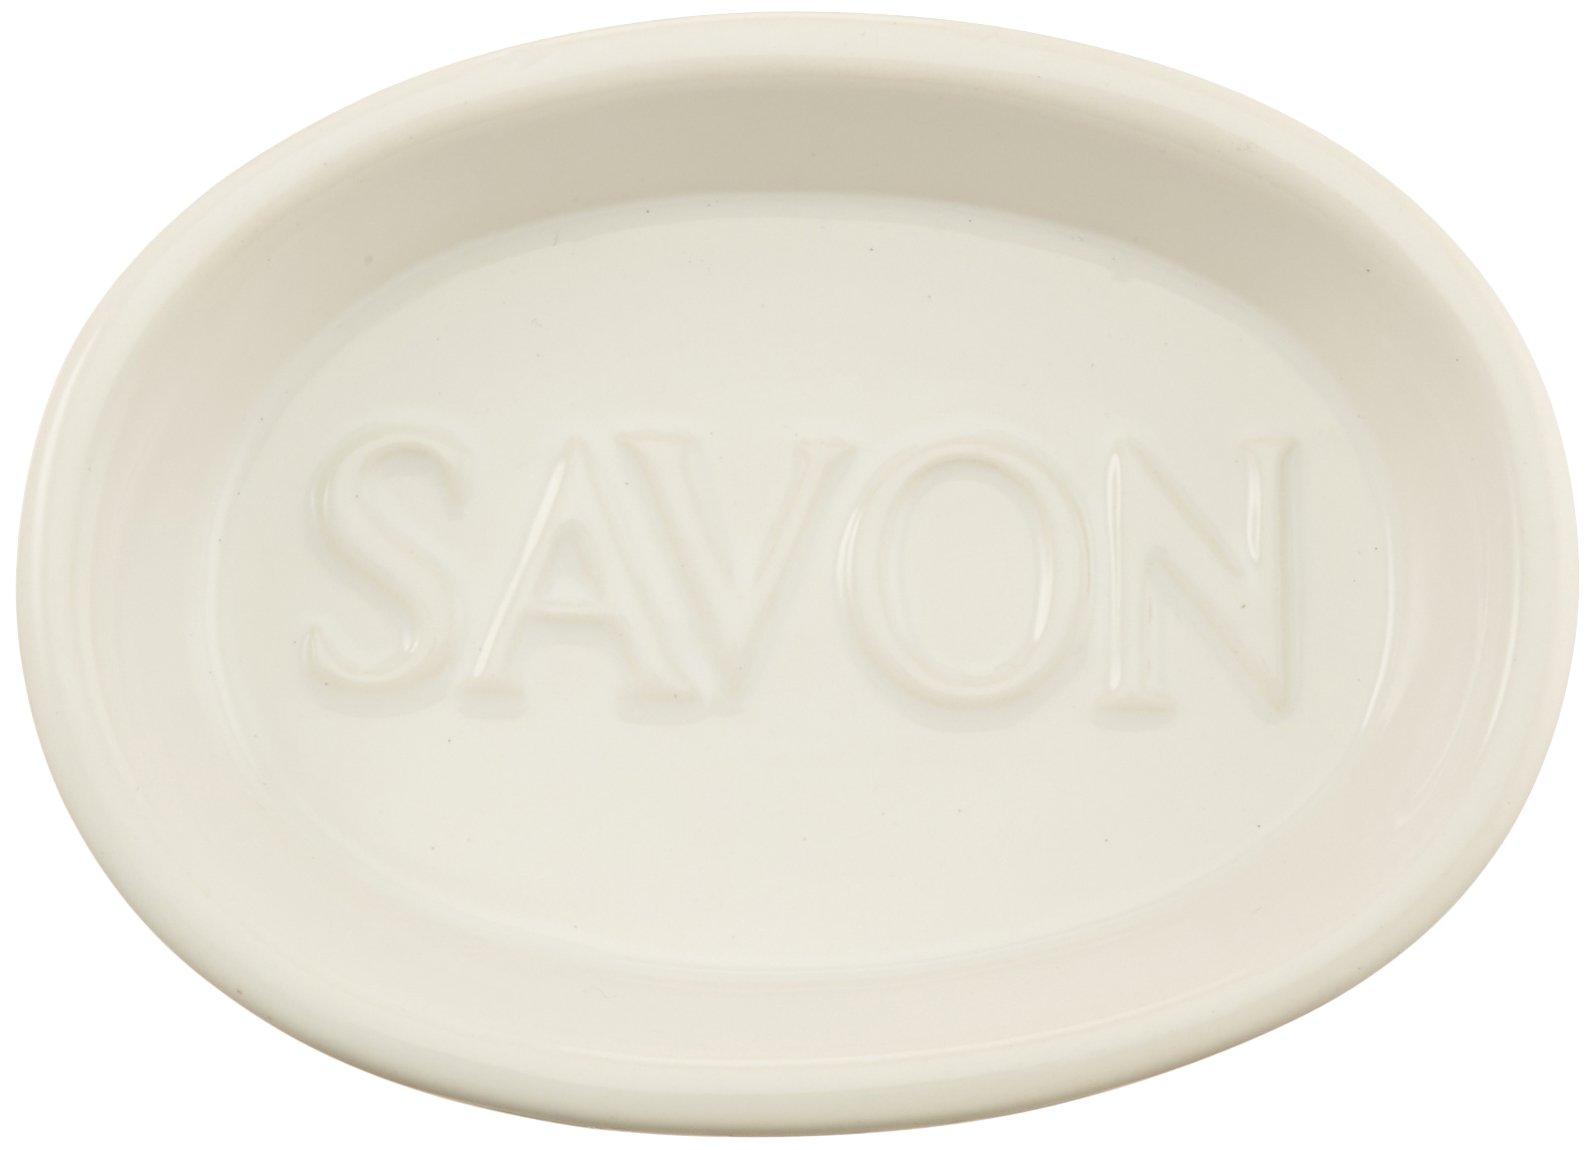 Abbott Collection White Oval Savon Dish by Abbott Collection (Image #2)